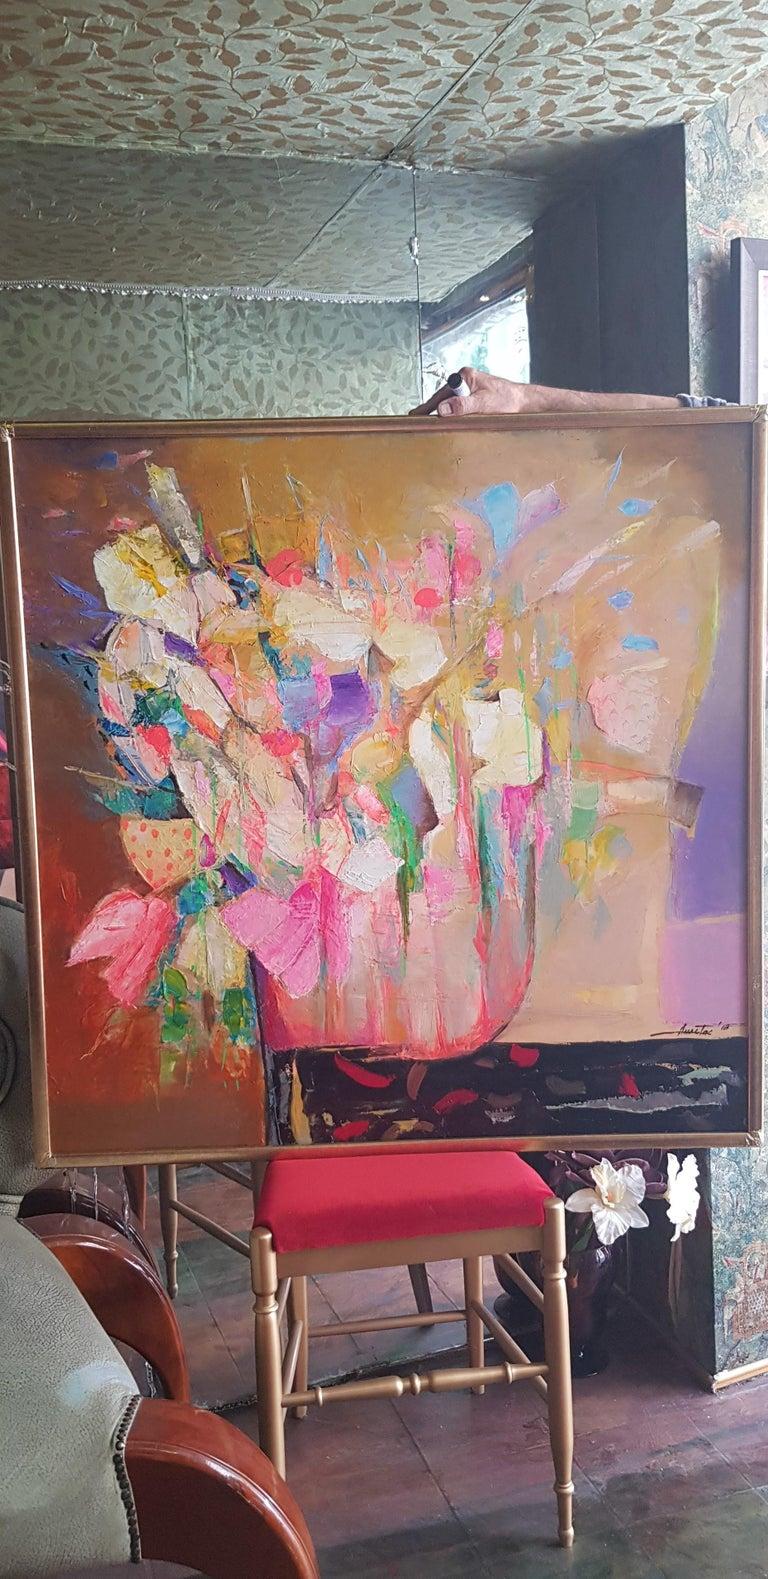 Allegro Con Brio - Painting by Anastas Kamburov